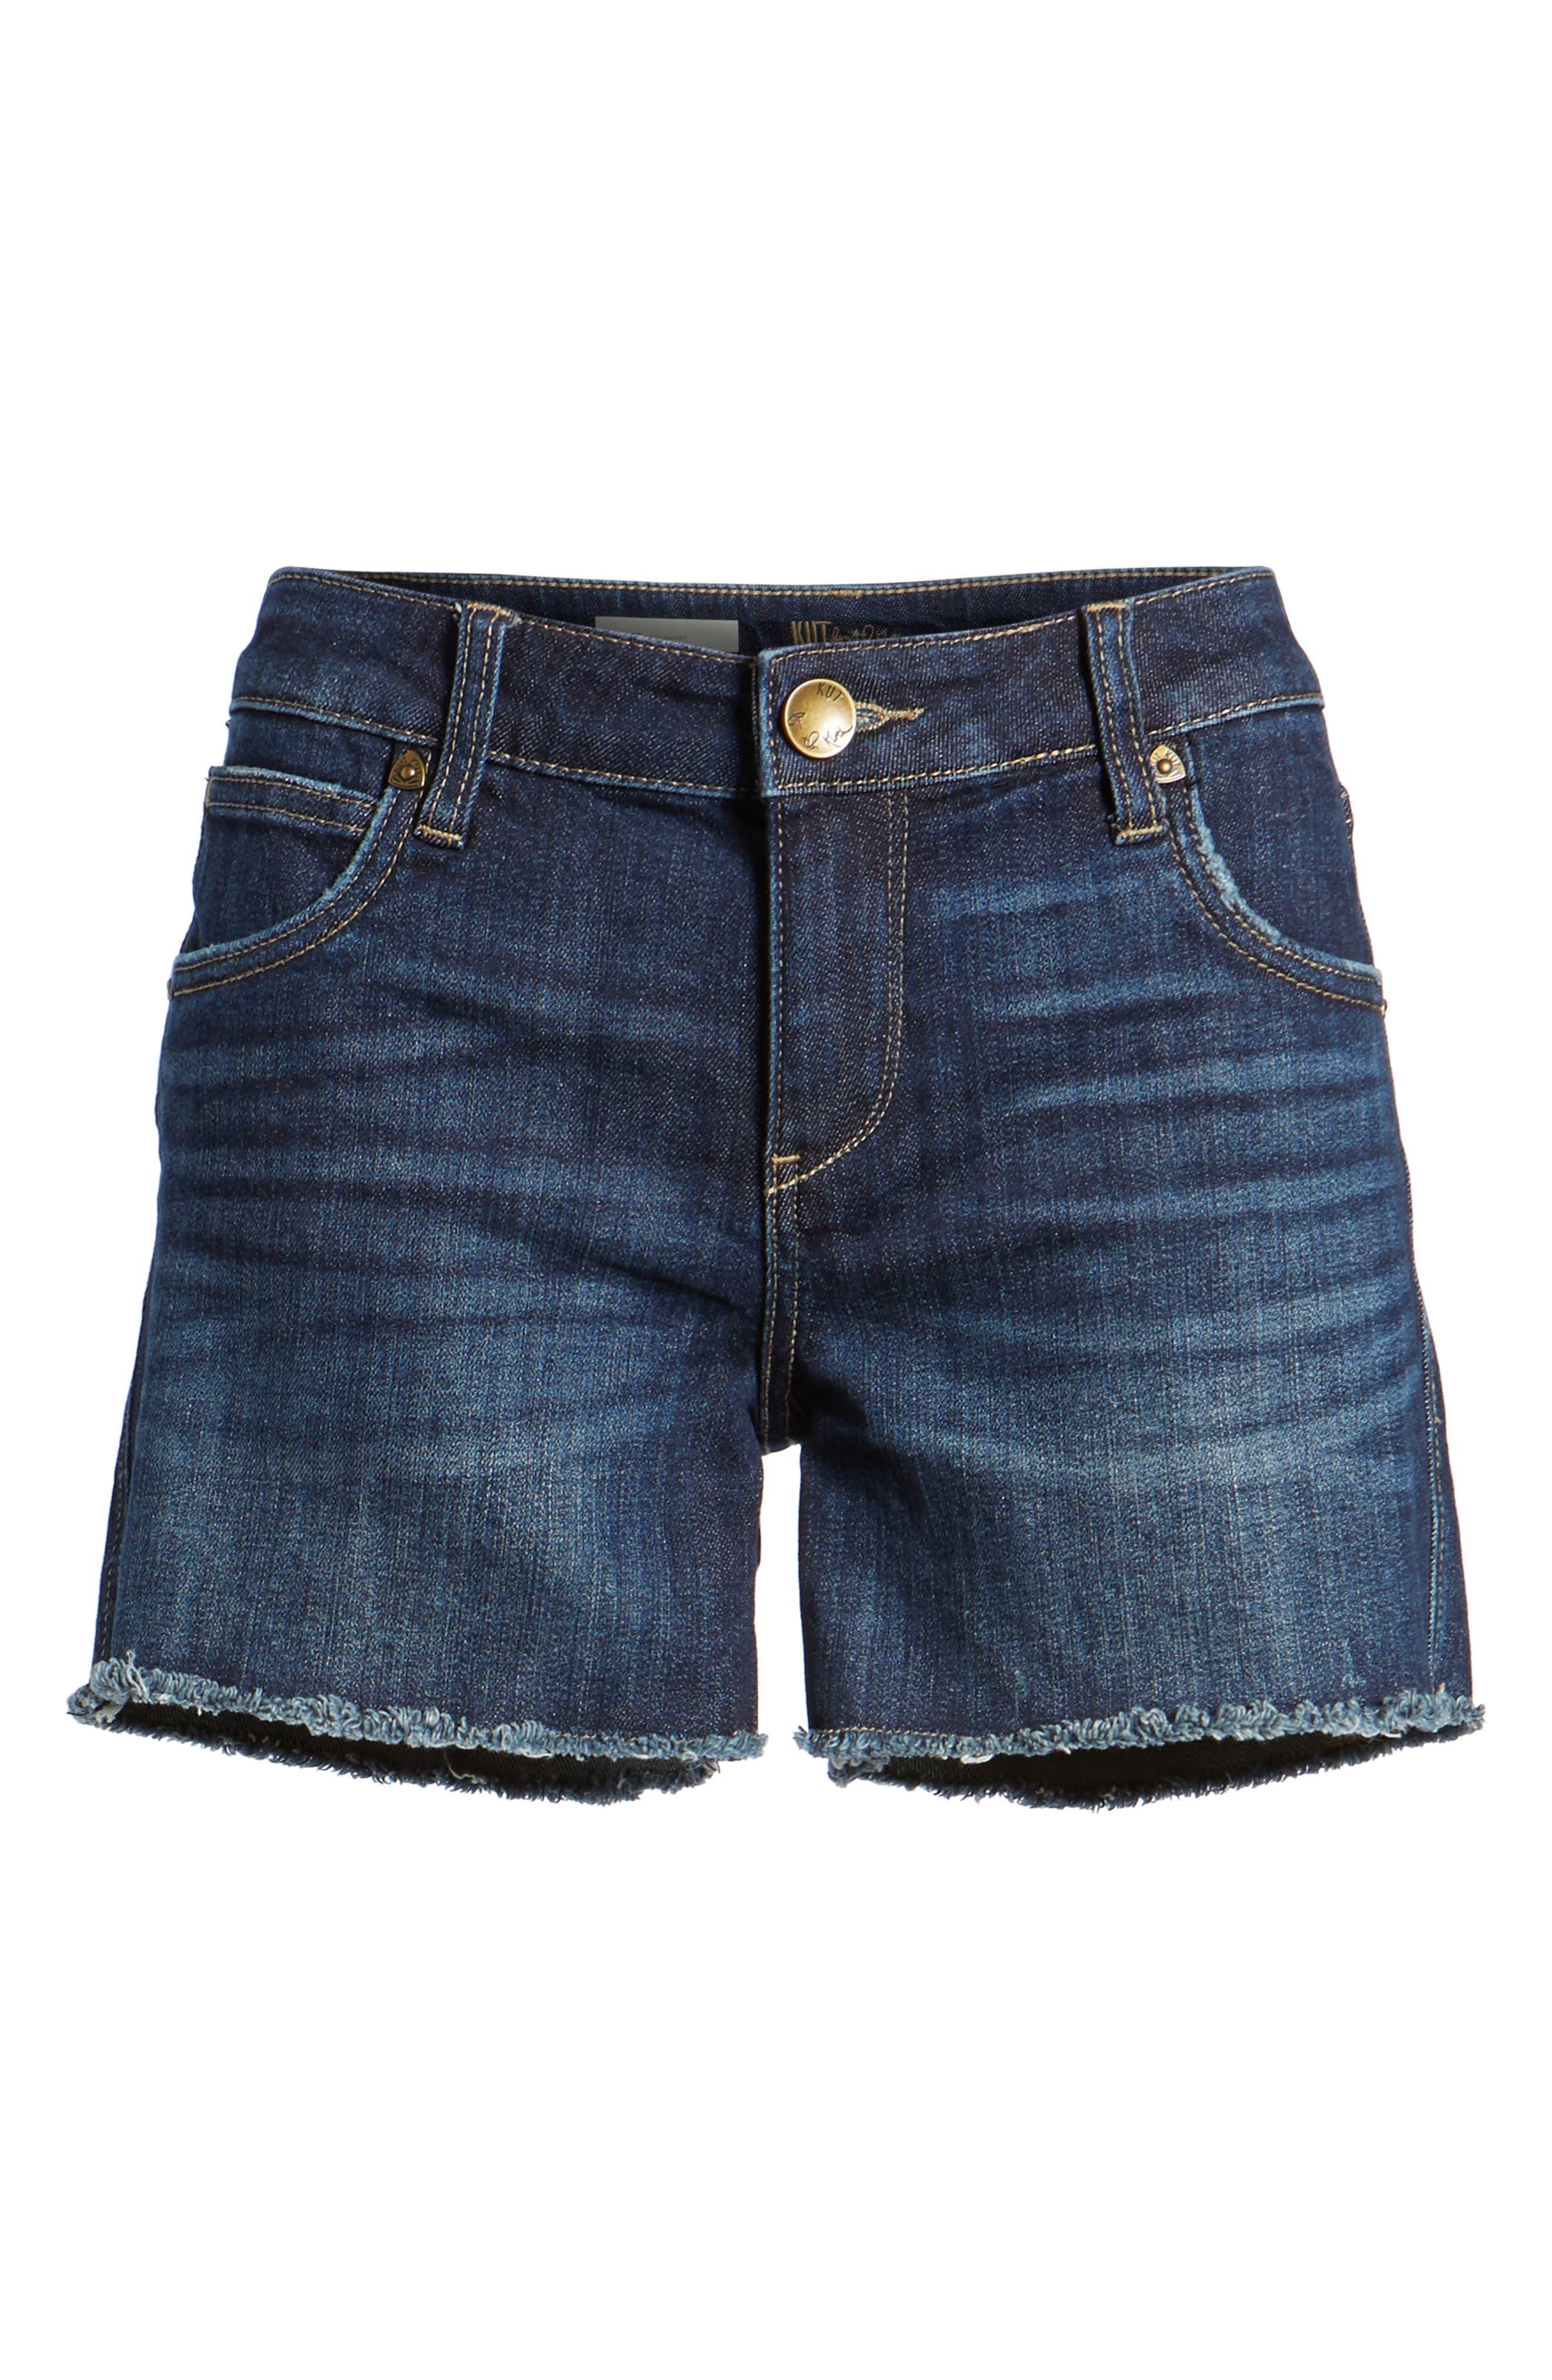 Gidget Denim Cutoff Shorts,                             Alternate thumbnail 7, color,                             STIMULATING